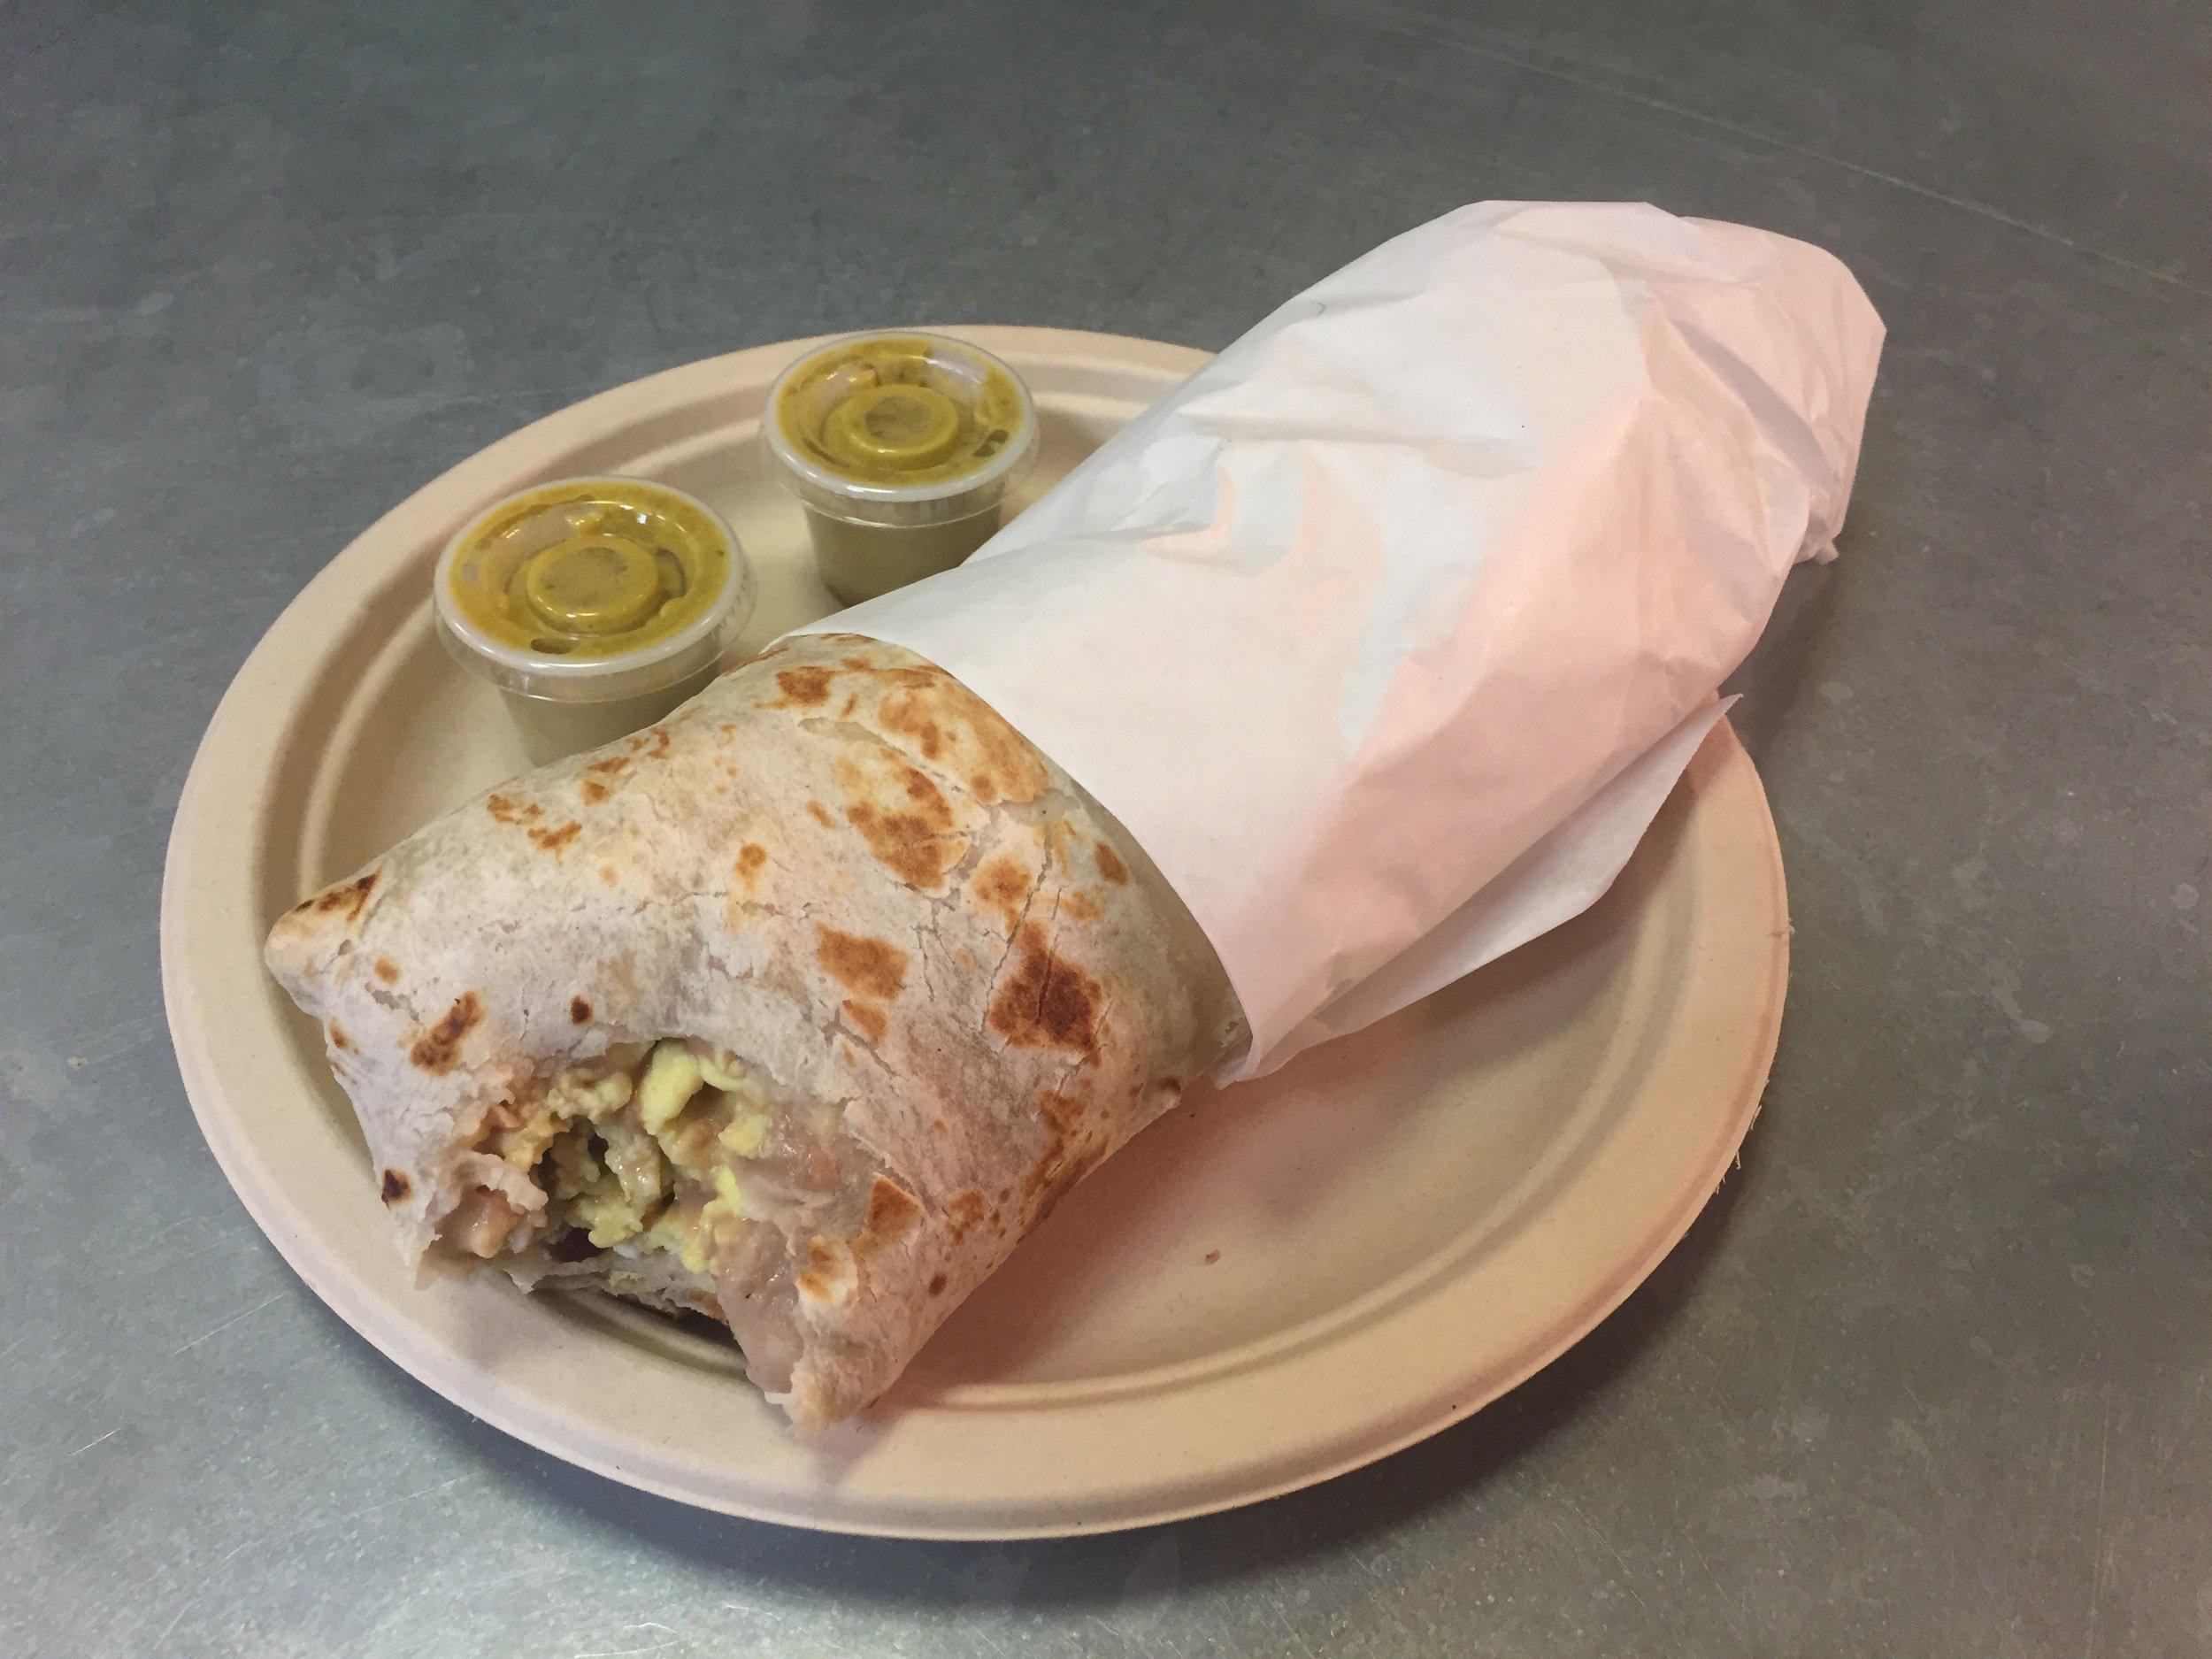 Lily's! Best breakfast burrito in California